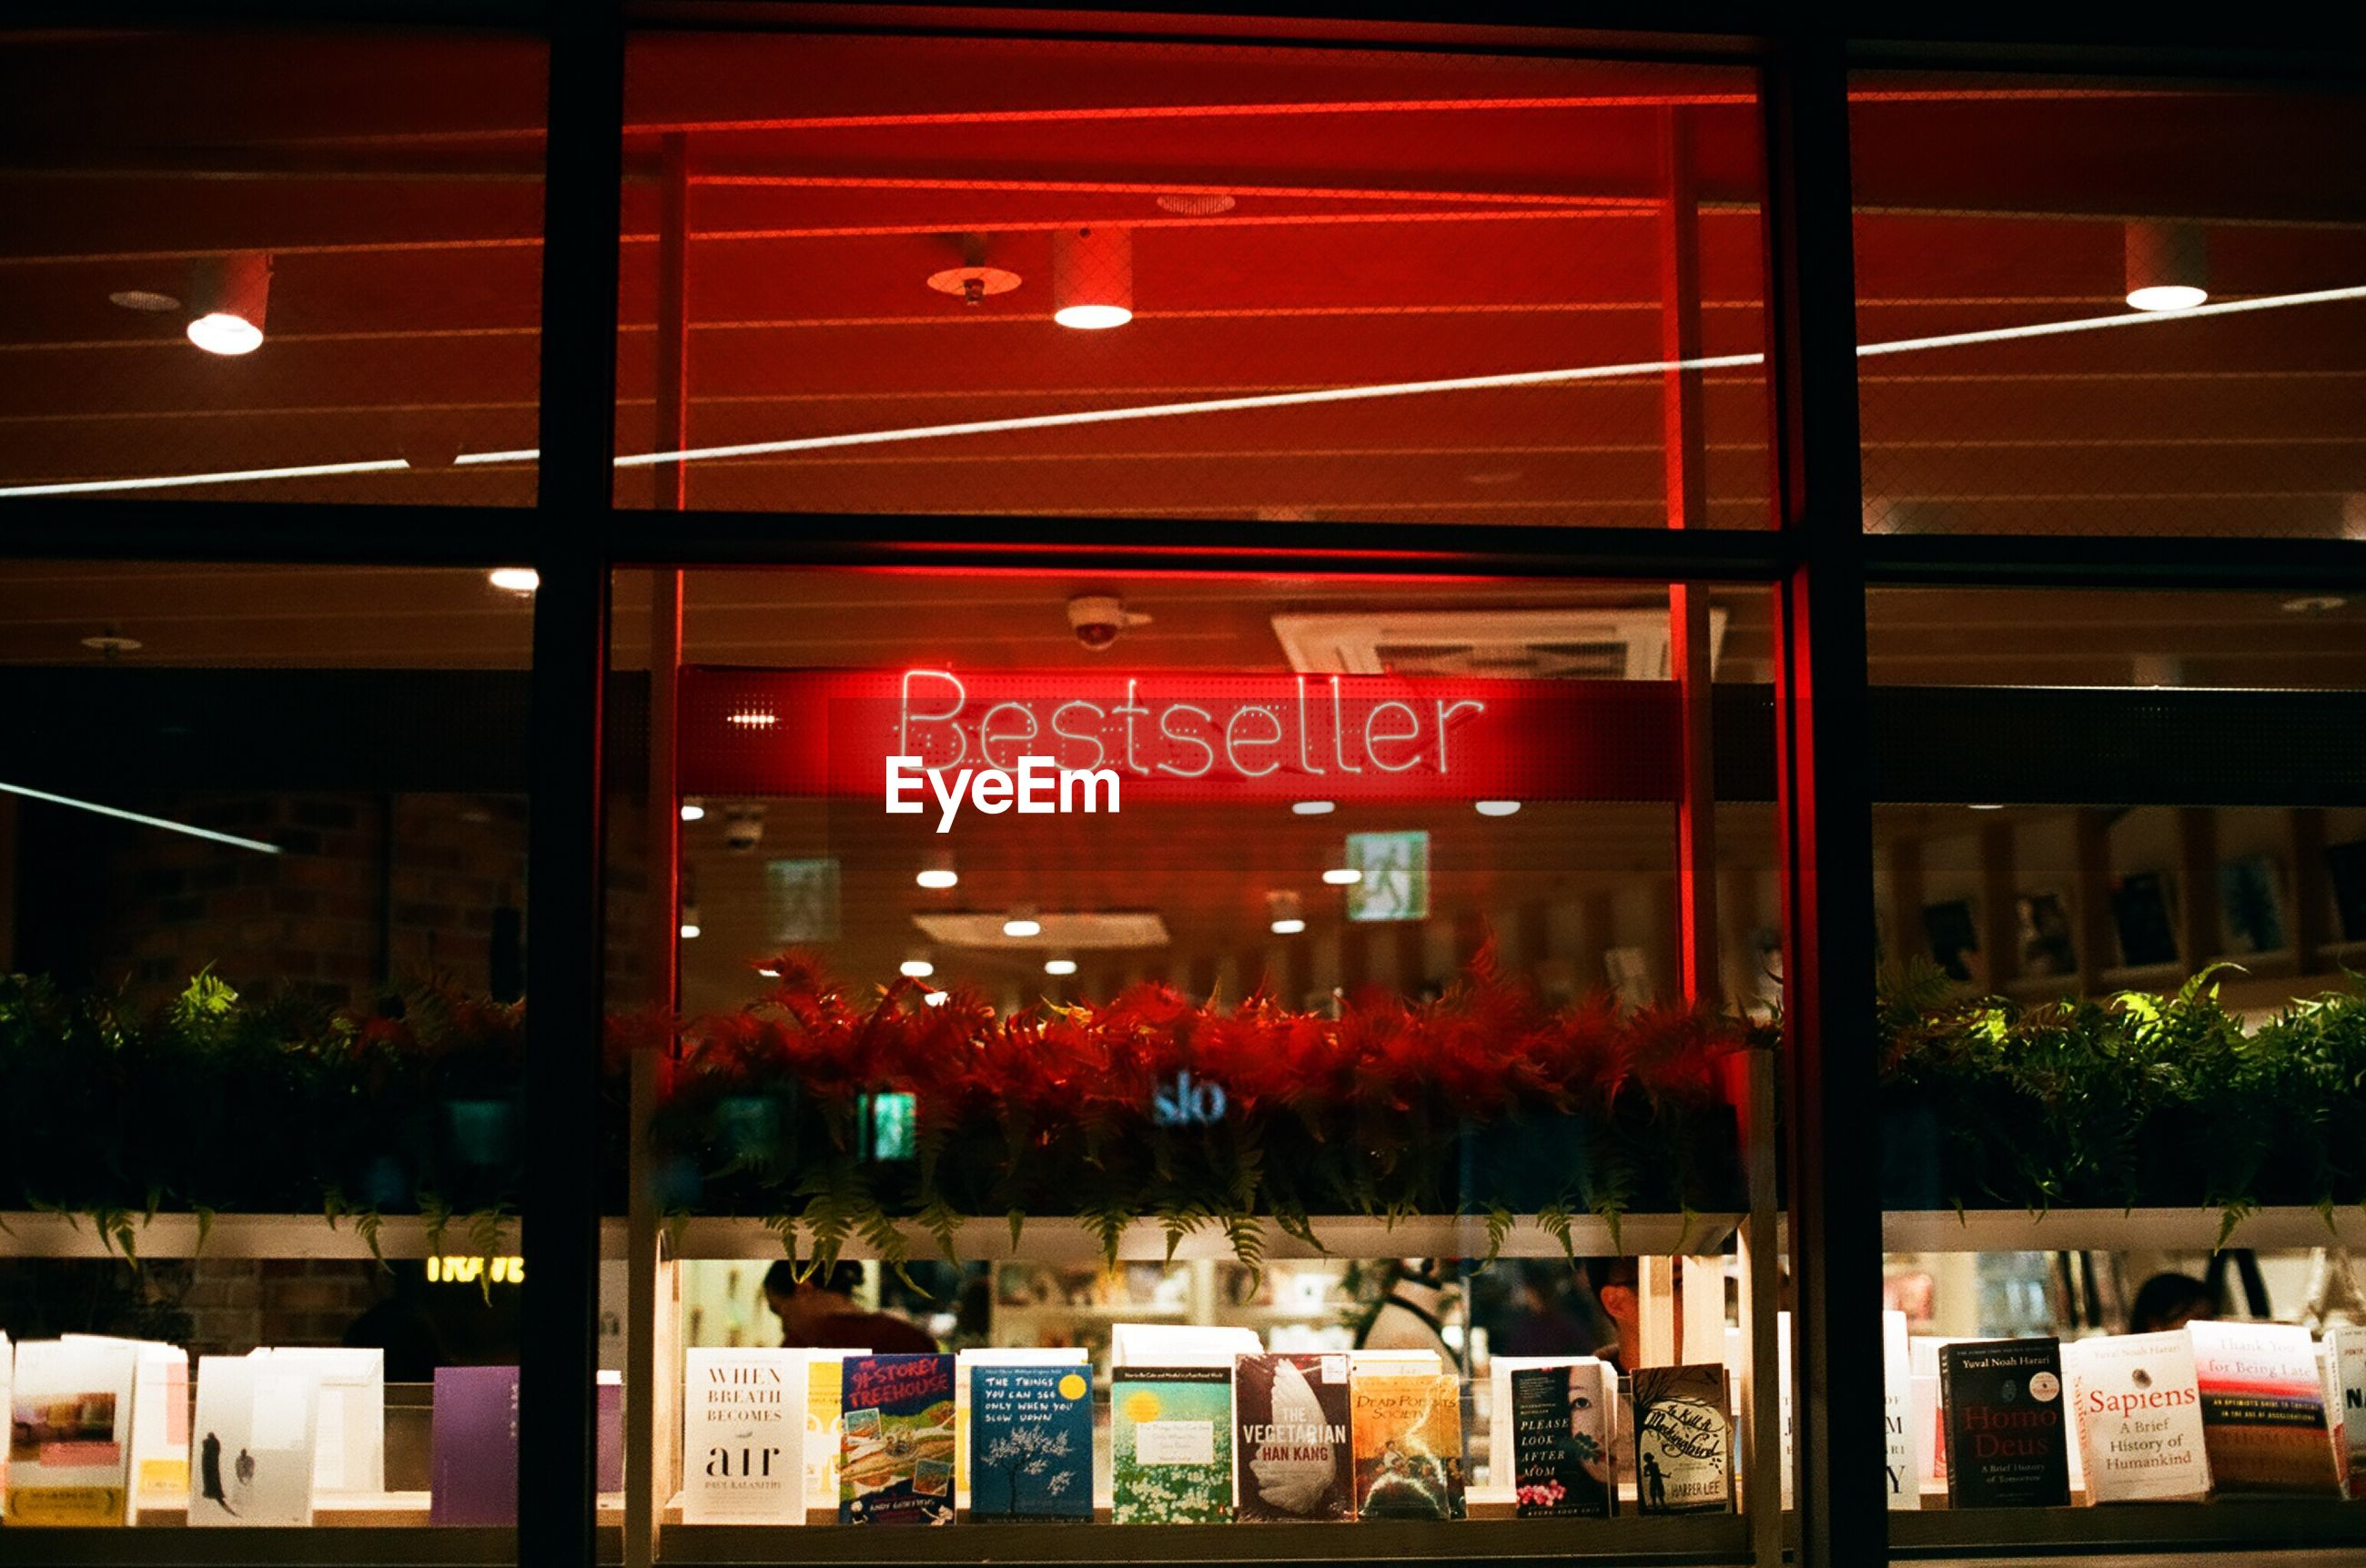 retail, store, text, consumerism, night, illuminated, choice, communication, indoors, business, no people, architecture, neon, supermarket